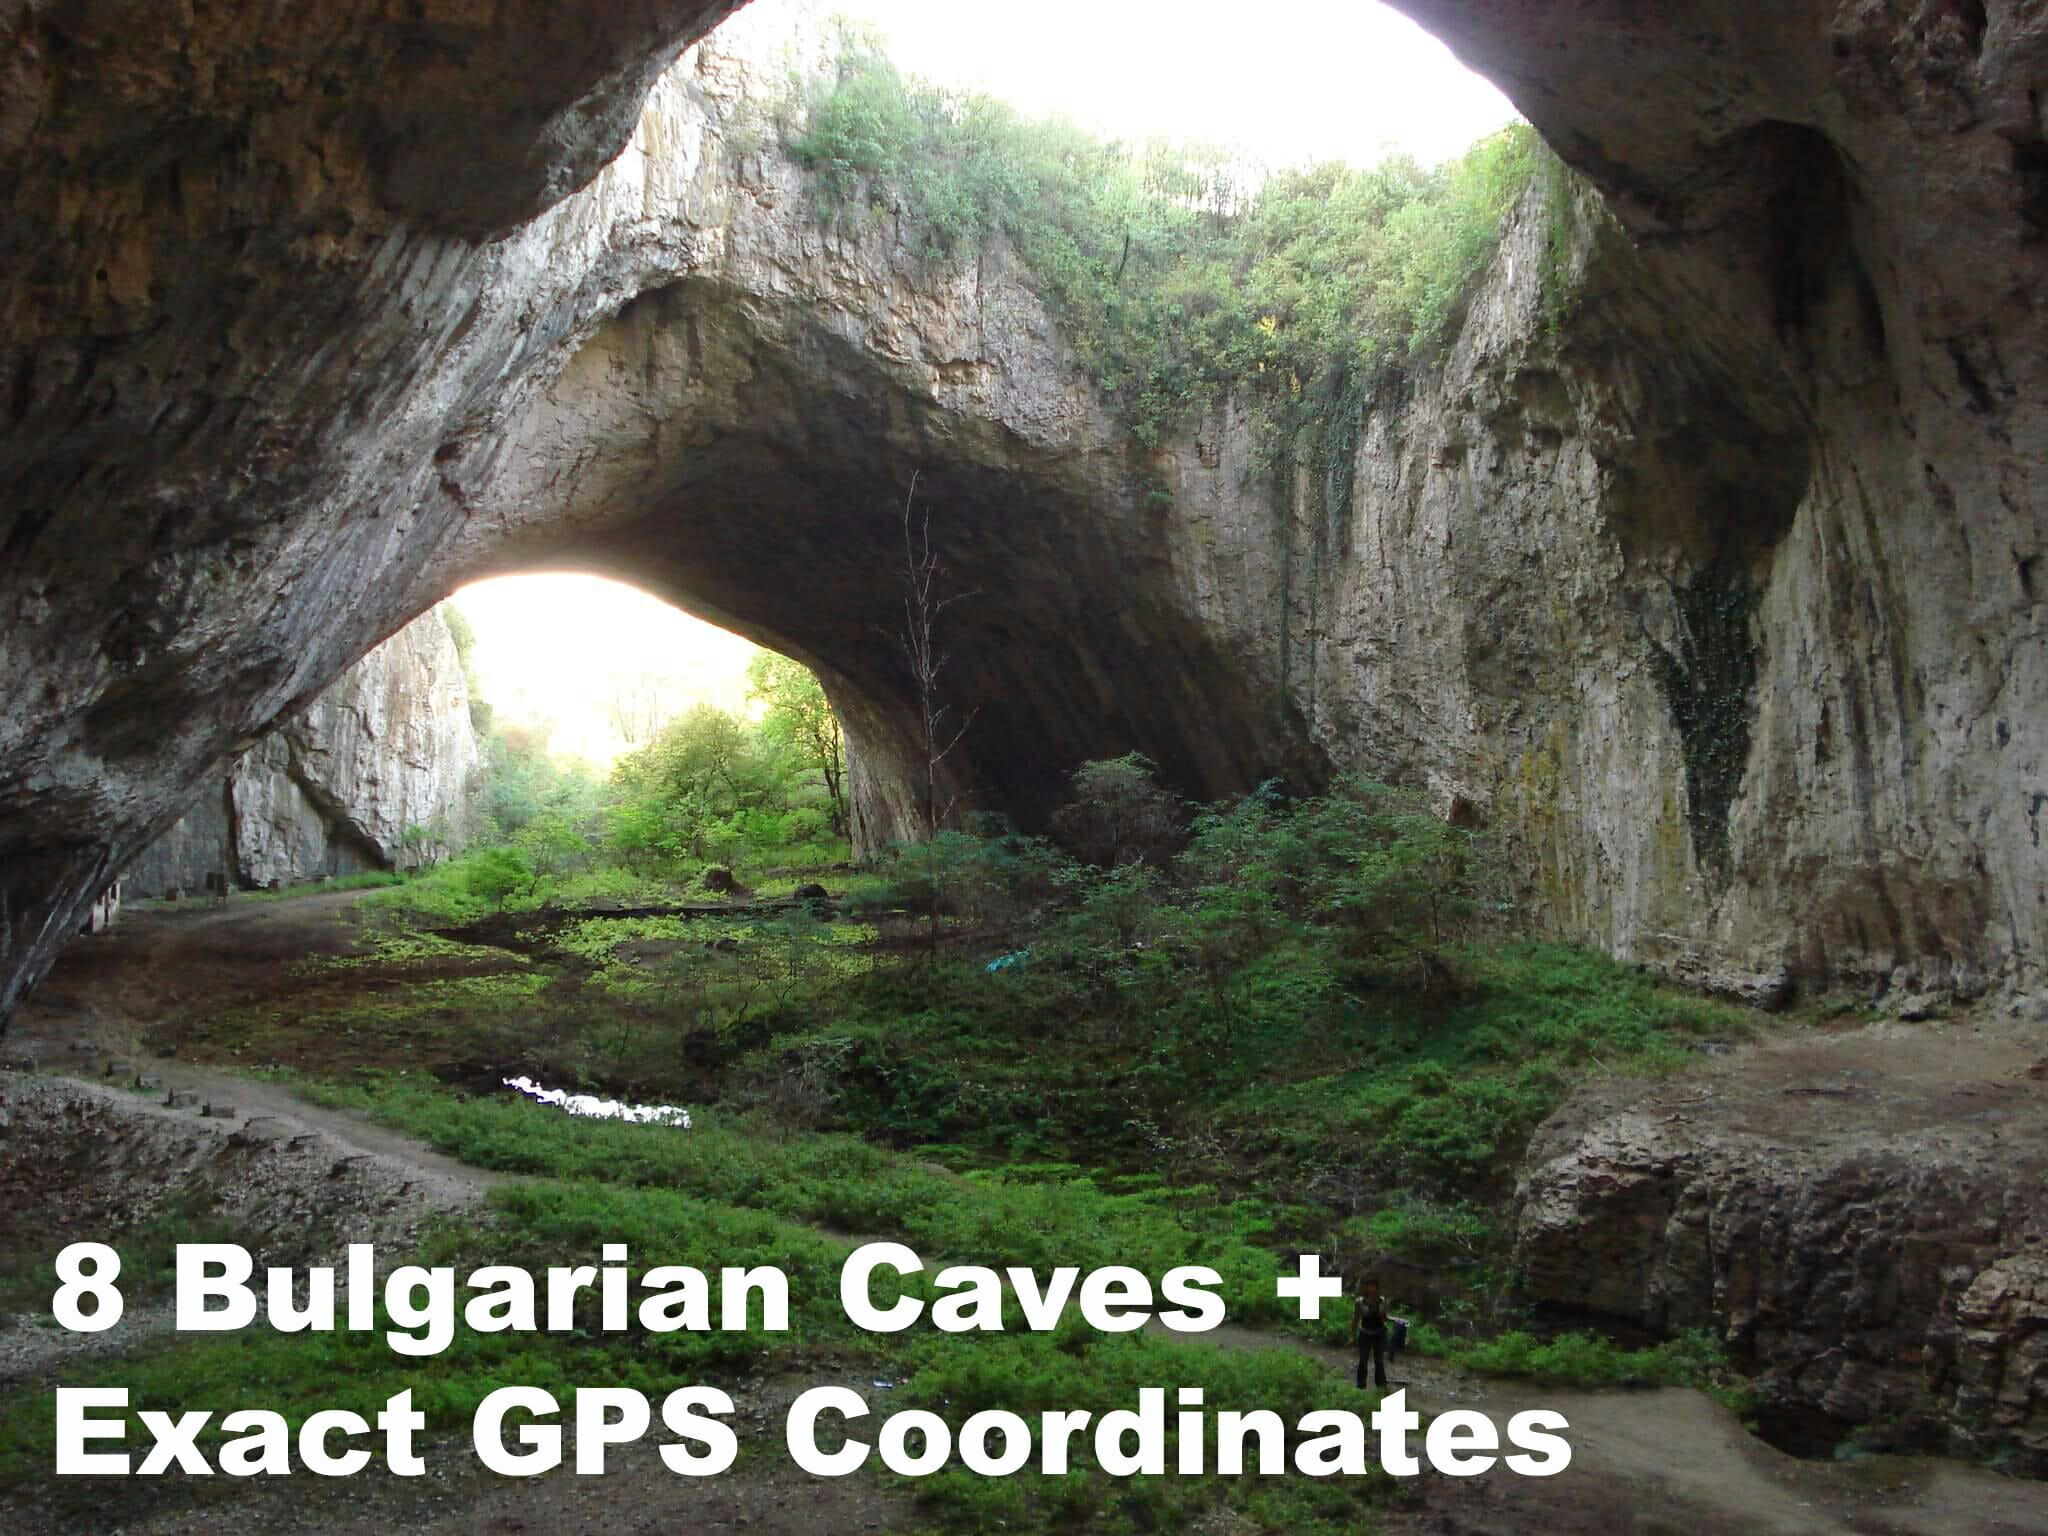 8 Bulgarian Caves